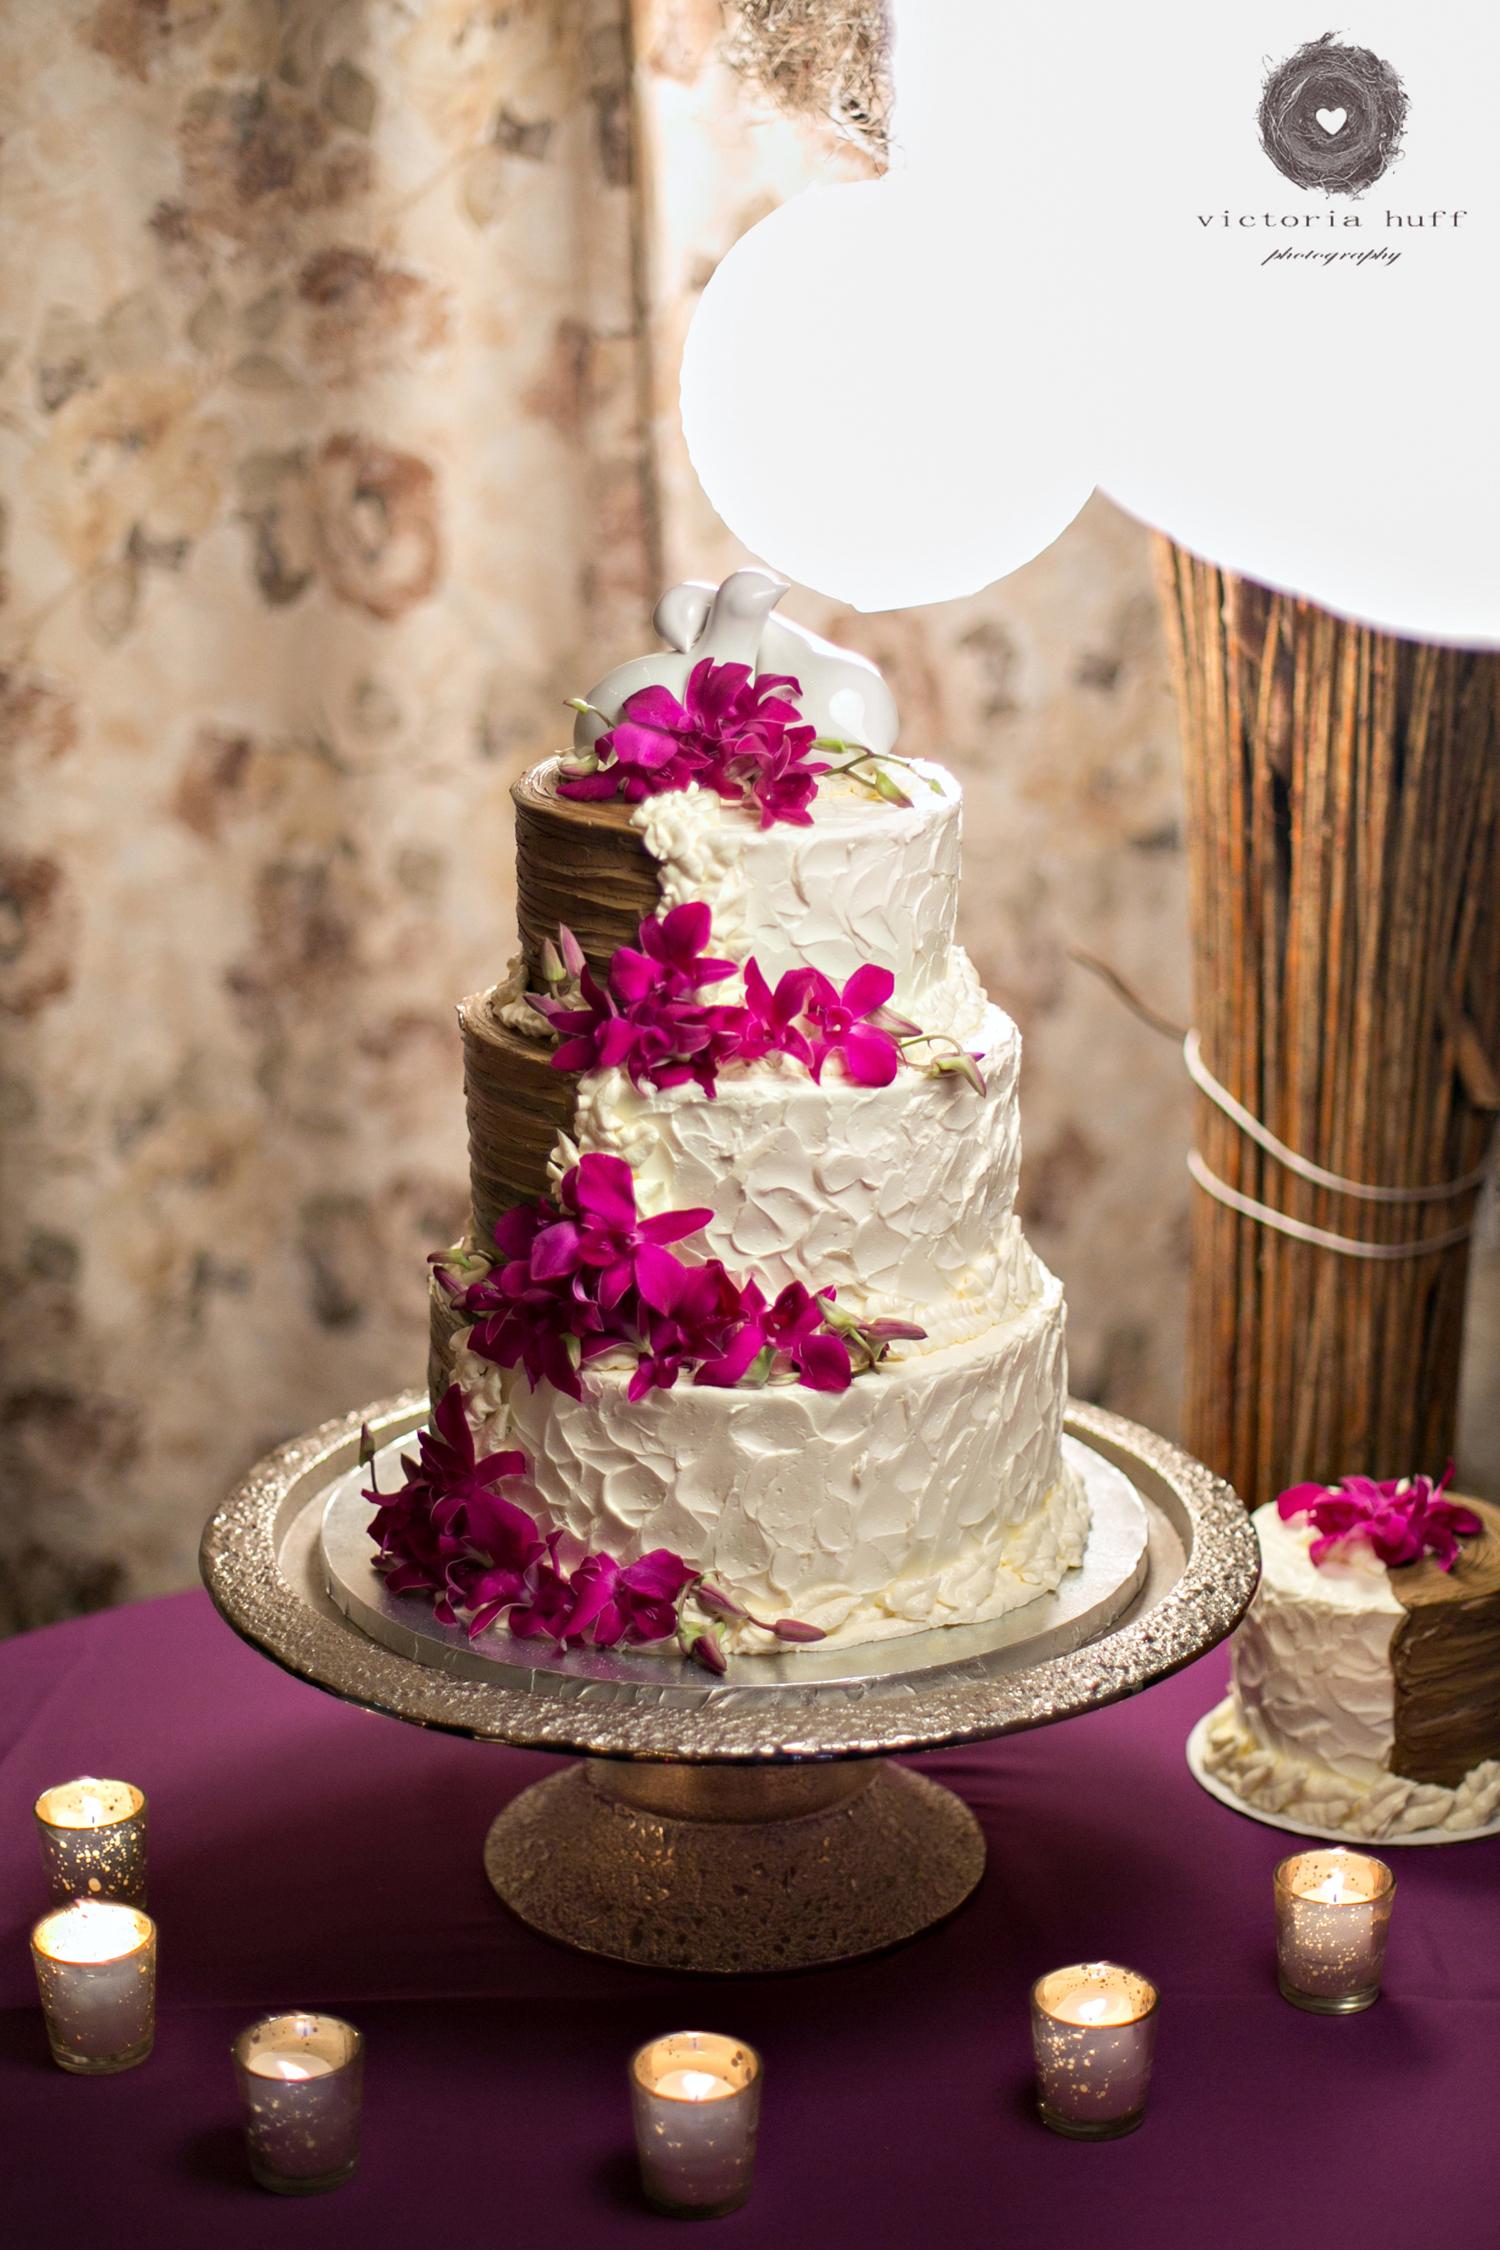 Wedding-Photography-Meagan-Kerske-Reynolds-Nashville-Tennessee-Centennial-Park-Gardens-of-Babylon-Wedding-cake.jpg